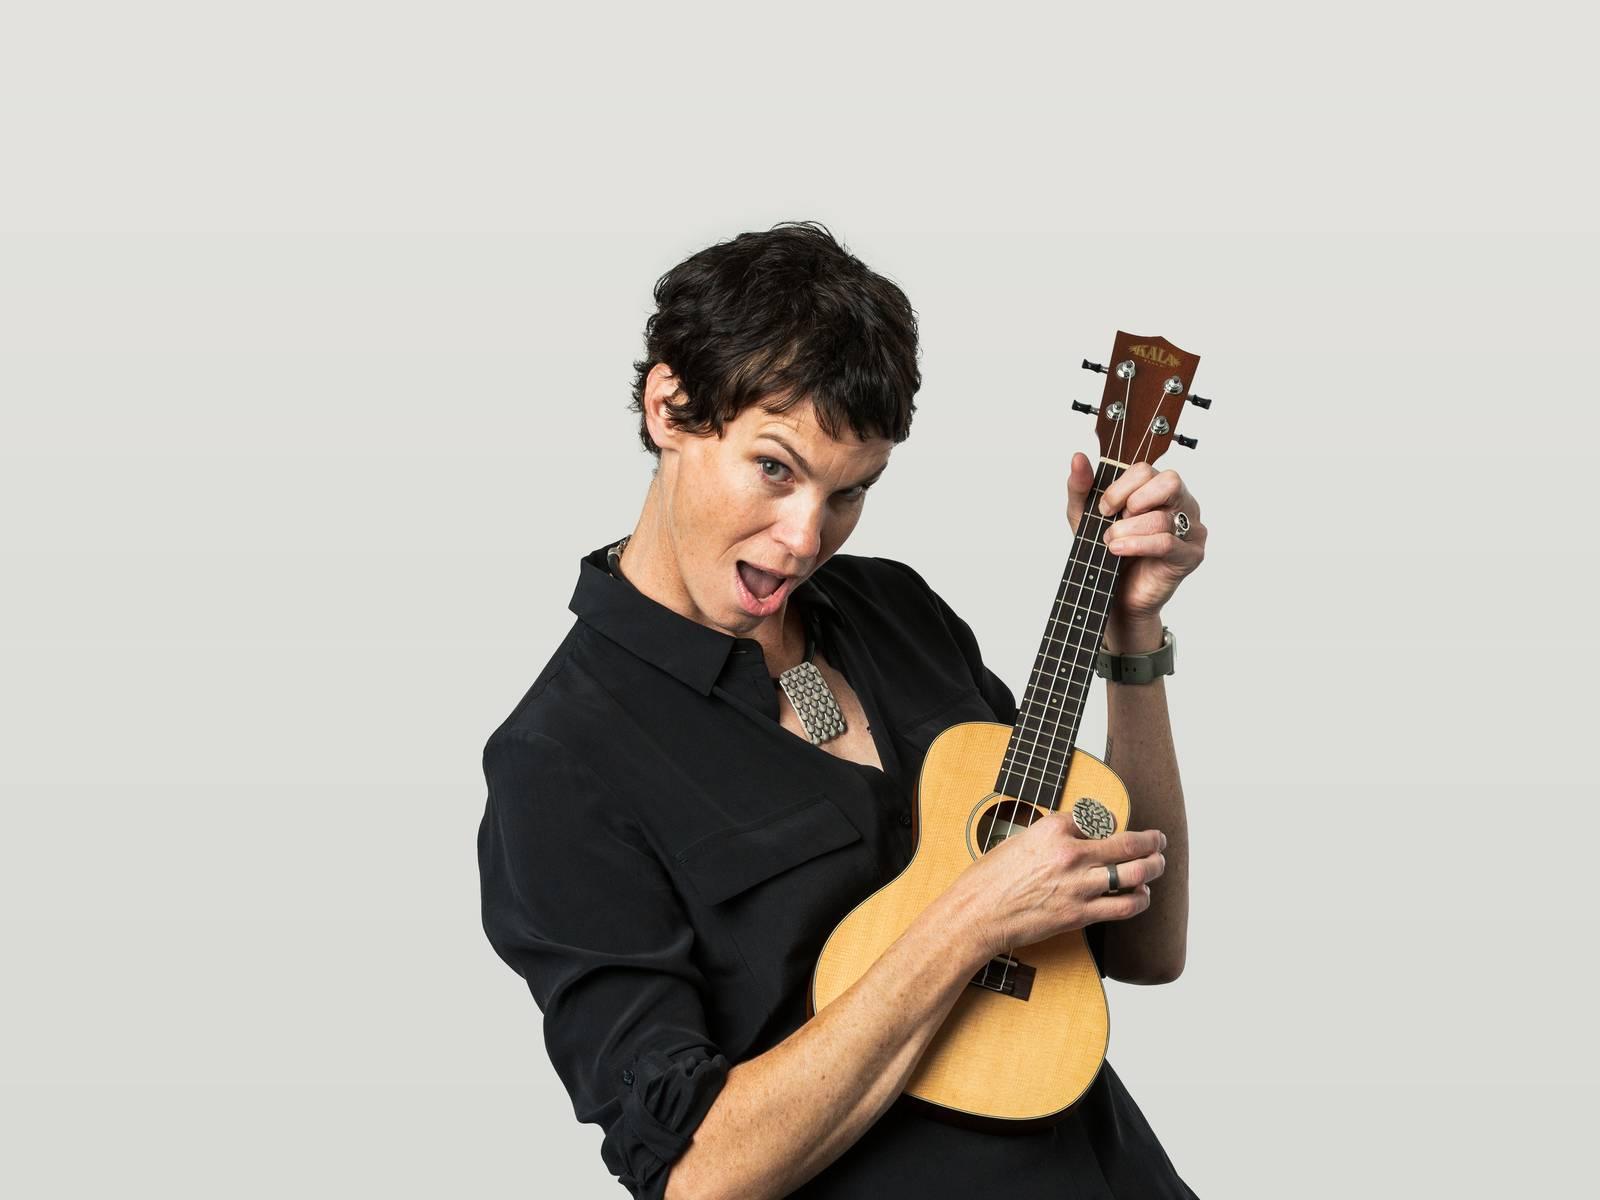 Bron playing the ukelele